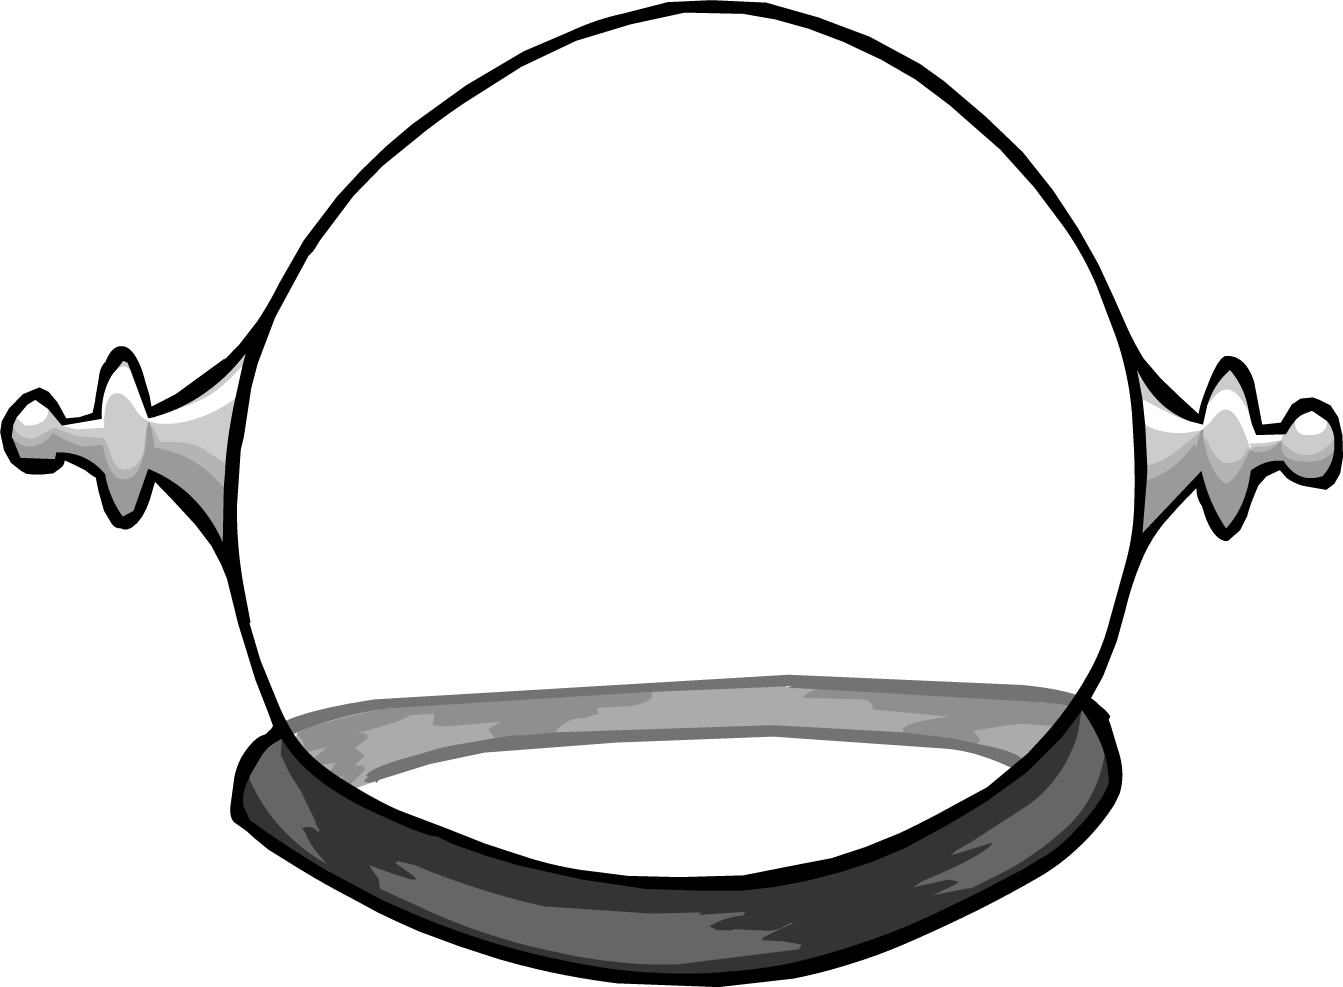 Space Helmet Club Penguin Wiki Fandom Powered Wikia